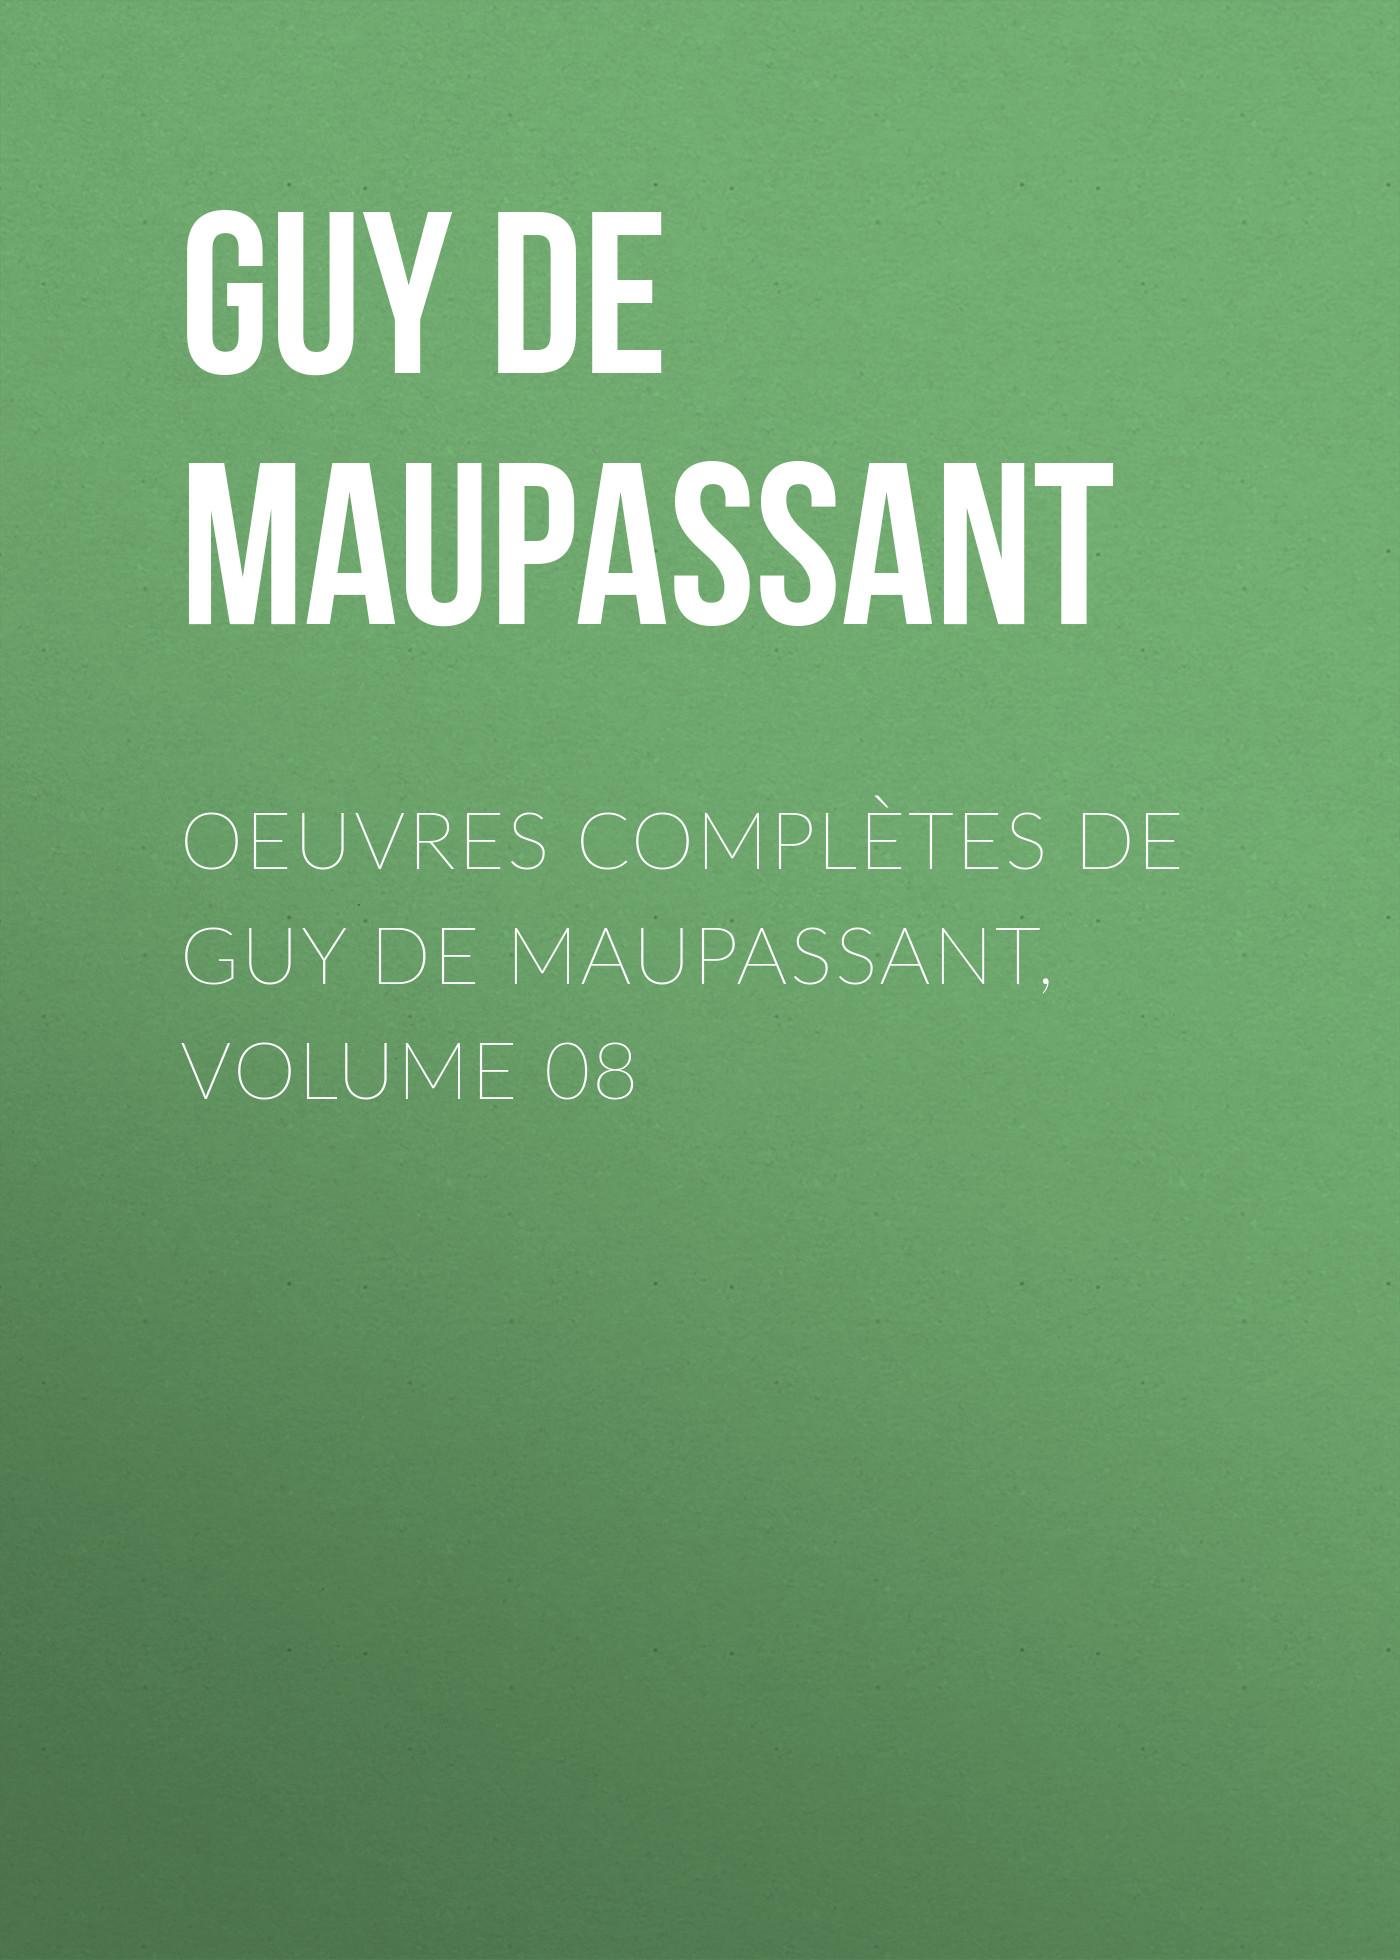 цена на Ги де Мопассан Oeuvres complètes de Guy de Maupassant, volume 08